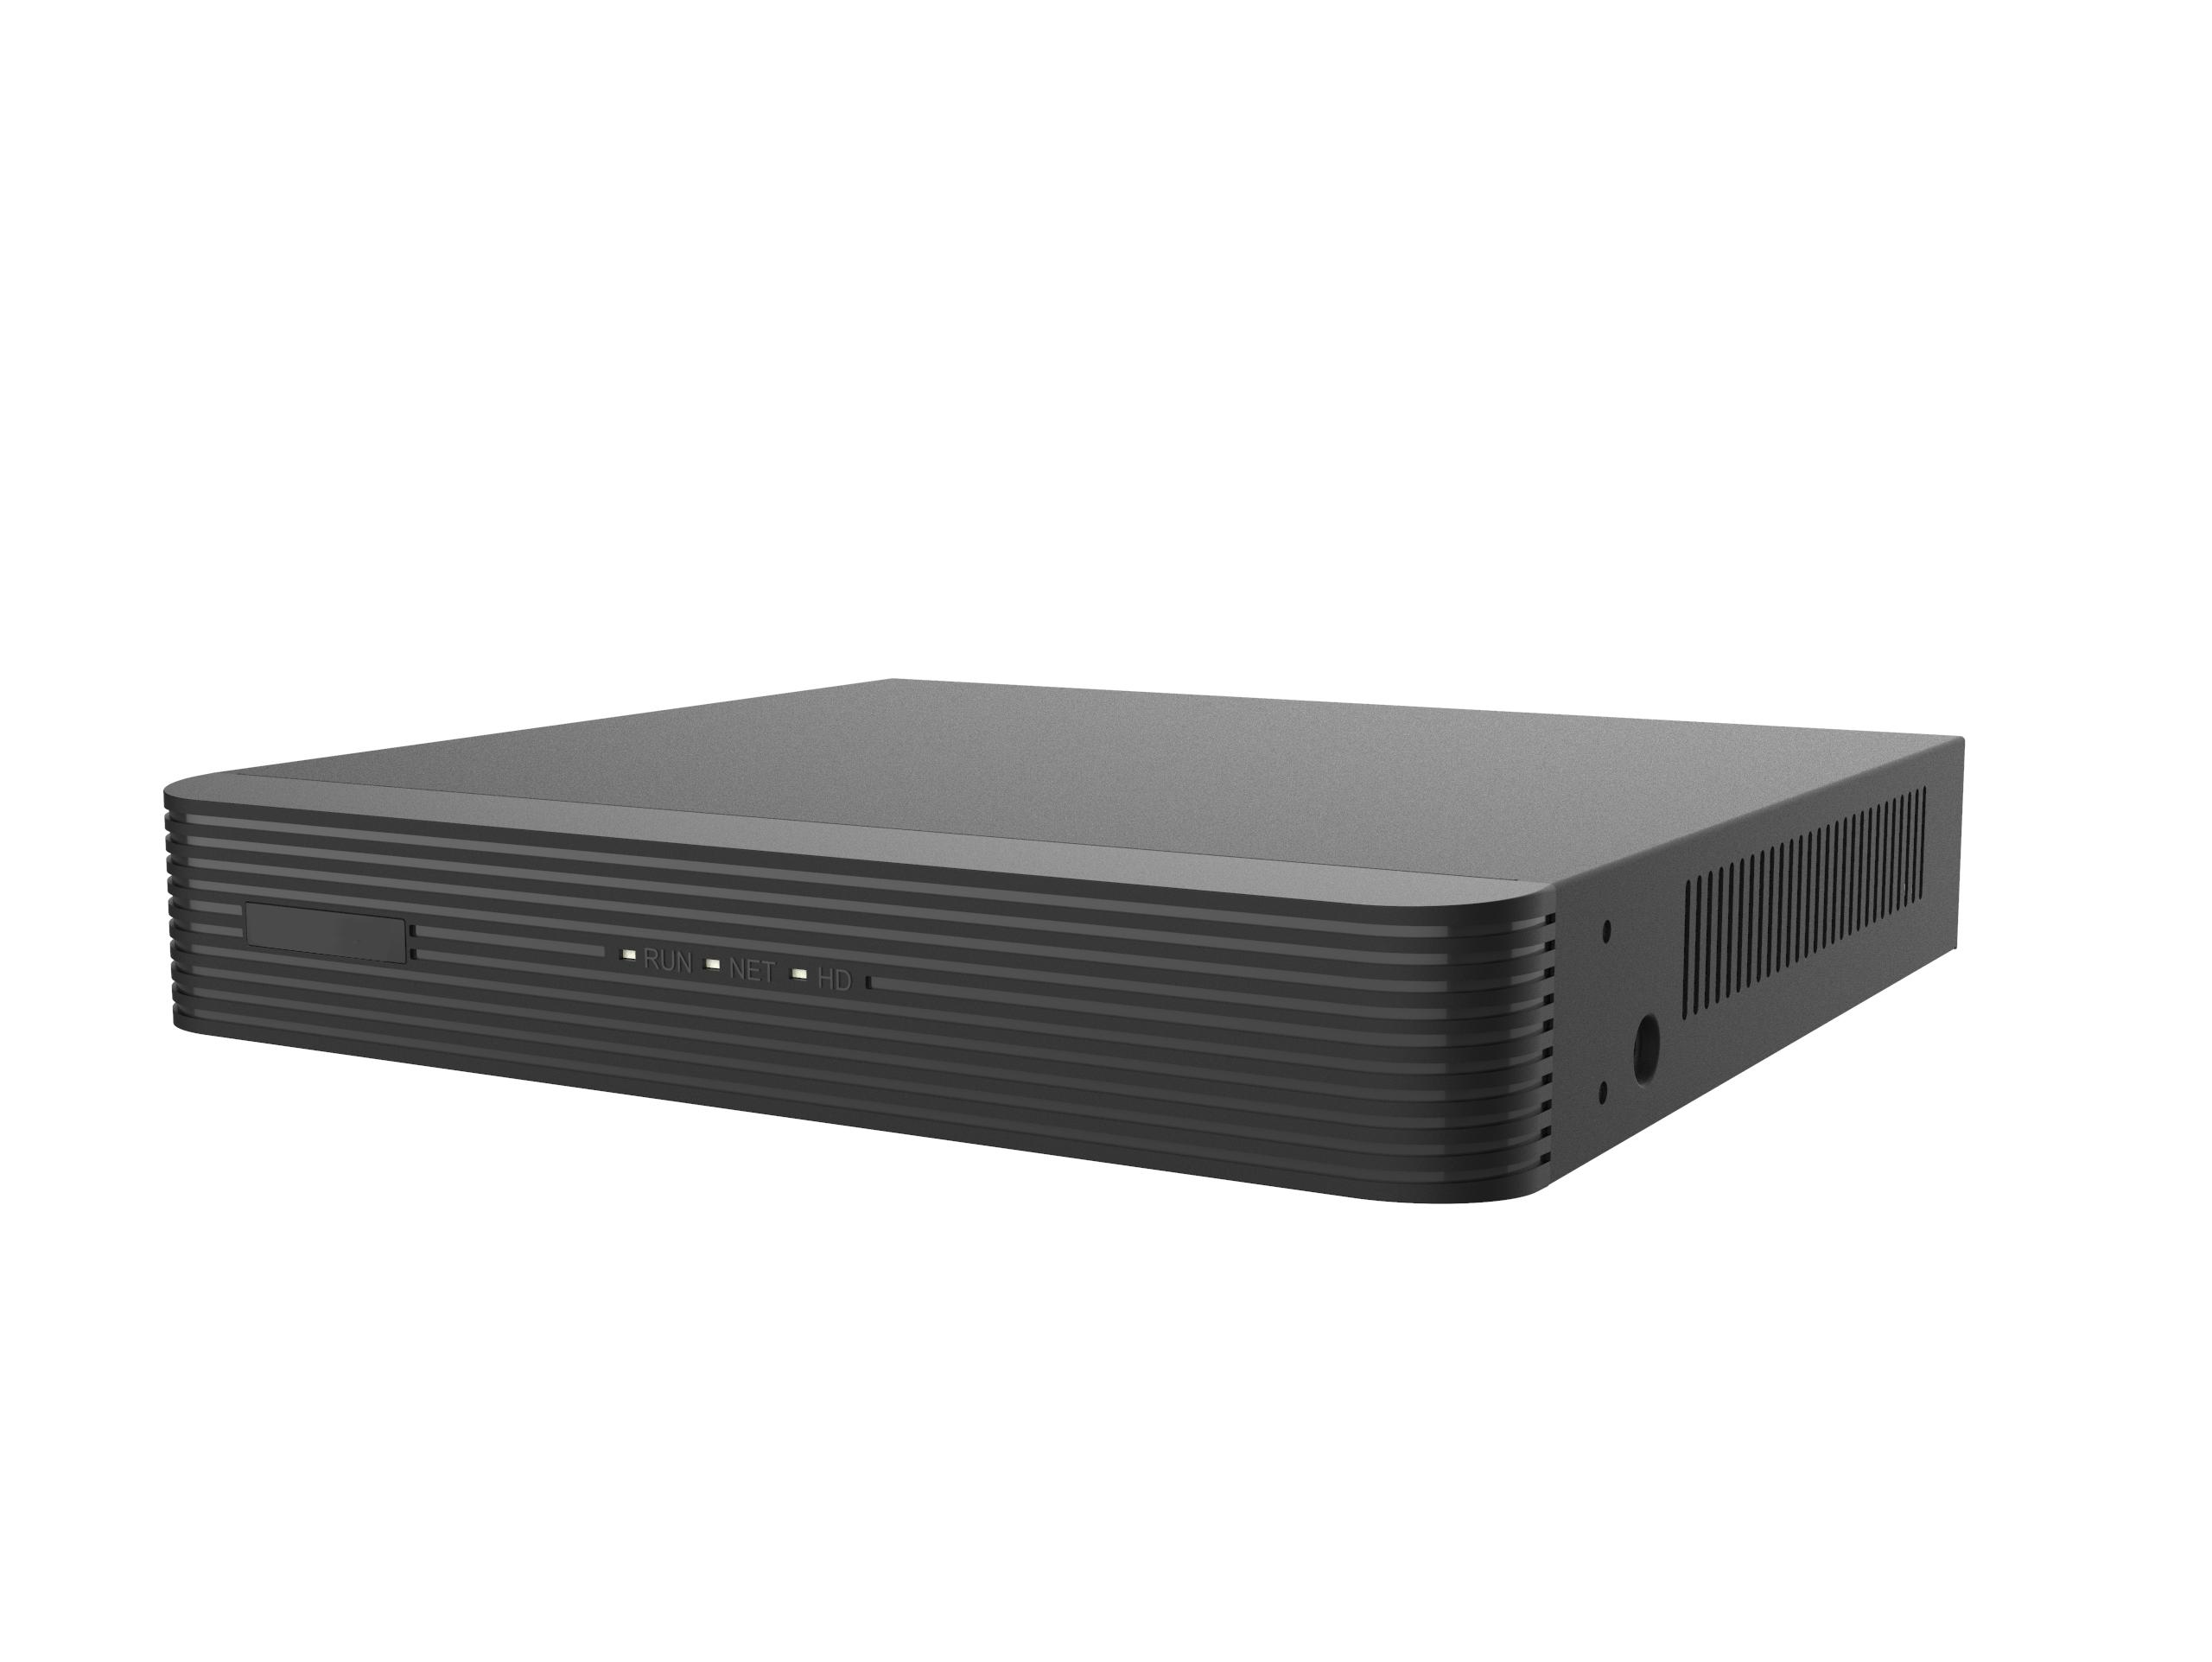 XVR ANGA AQ-6908N5, 12CH (8BNC+4IP), 1 SATA Interface 6TB MAX,5MP Lite, H.265, smartphone, δικτυακό,USB,Backup,VGA,HDMI,AUDIO IN 1-AUDIO OUT 1